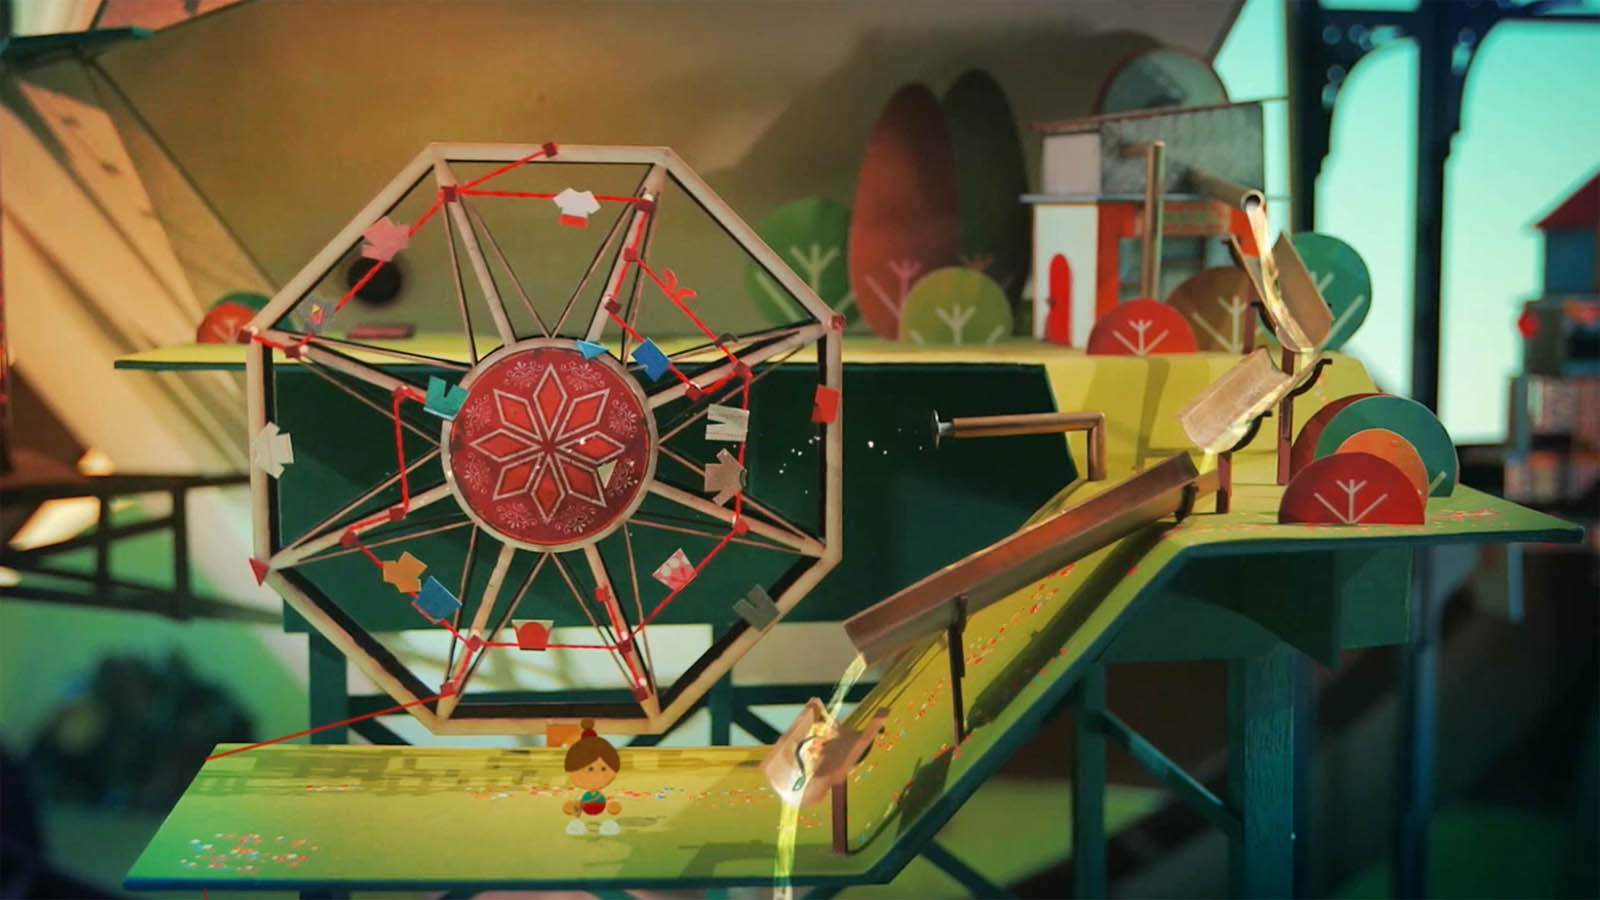 تحميل لعبة Lumino City كاملة مضغوطة برابط واحد مباشر